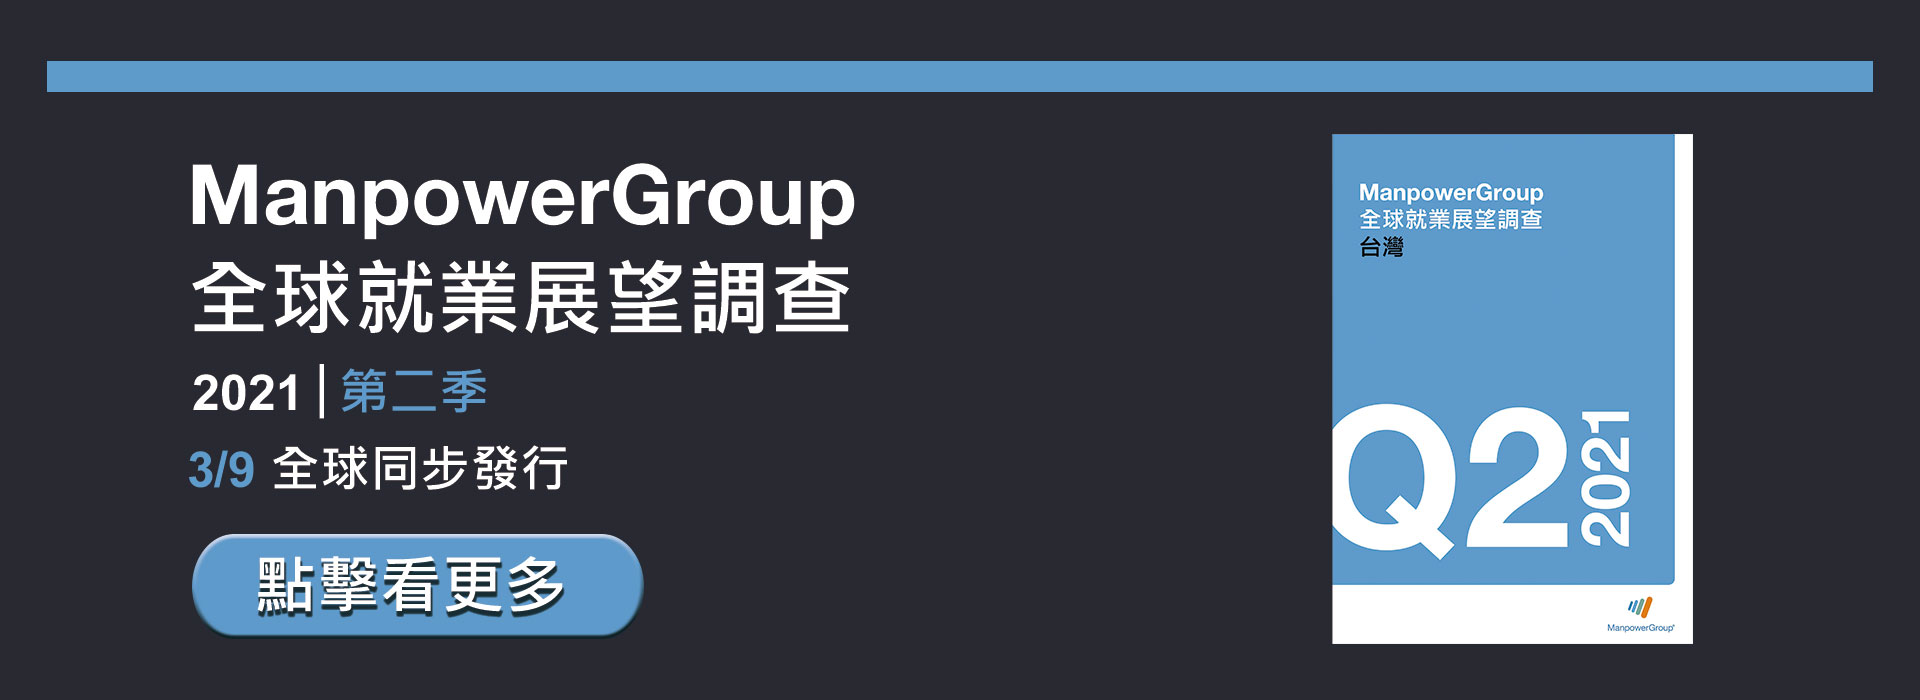 ManpowerGroup 2021 Q2 全球就業展望調查